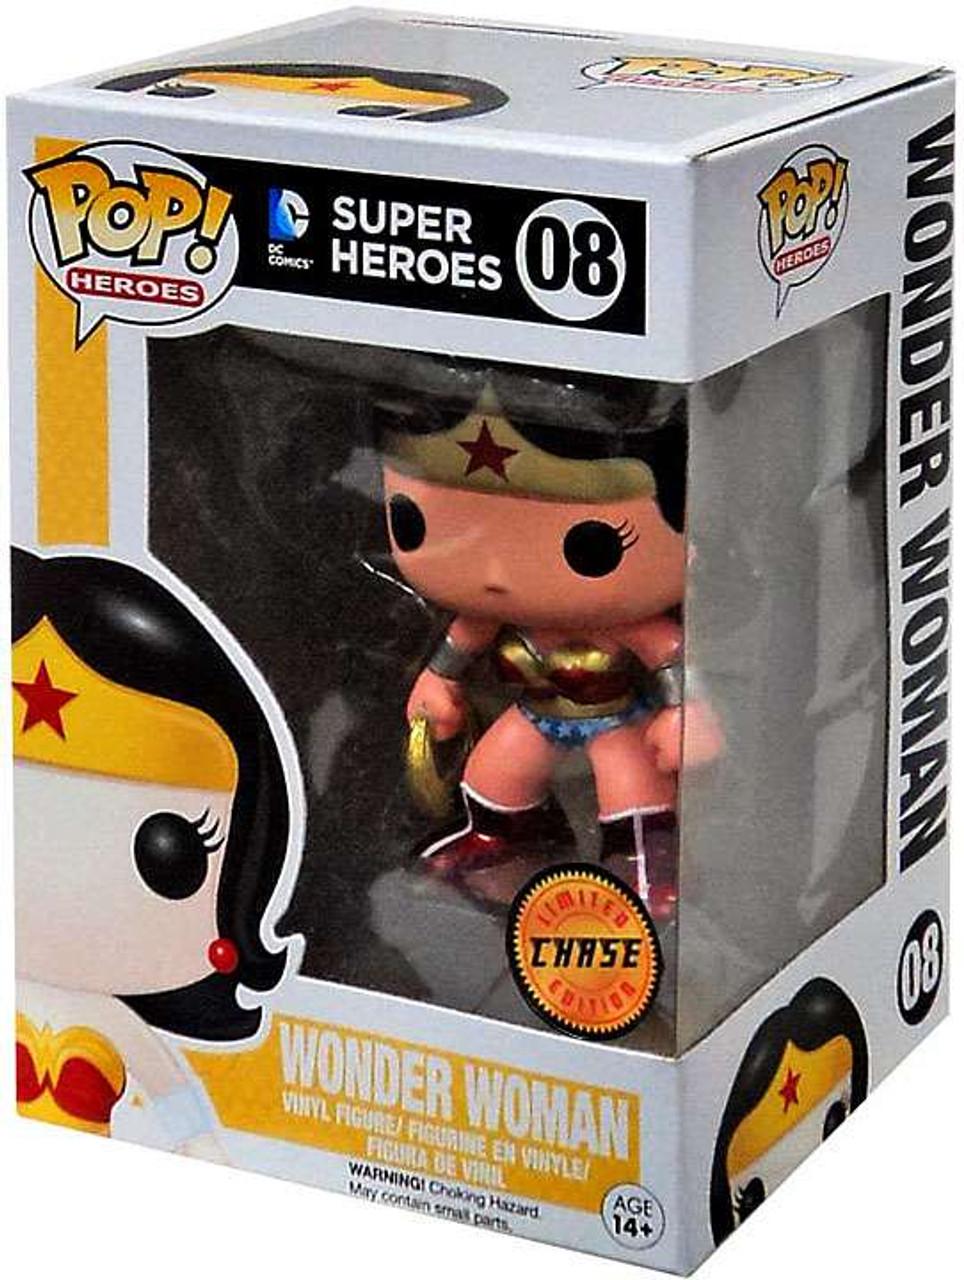 c8d879cb748 Funko DC Universe Funko POP Heroes Wonder Woman Vinyl Figure 08 Metallic  Chase Version - ToyWiz